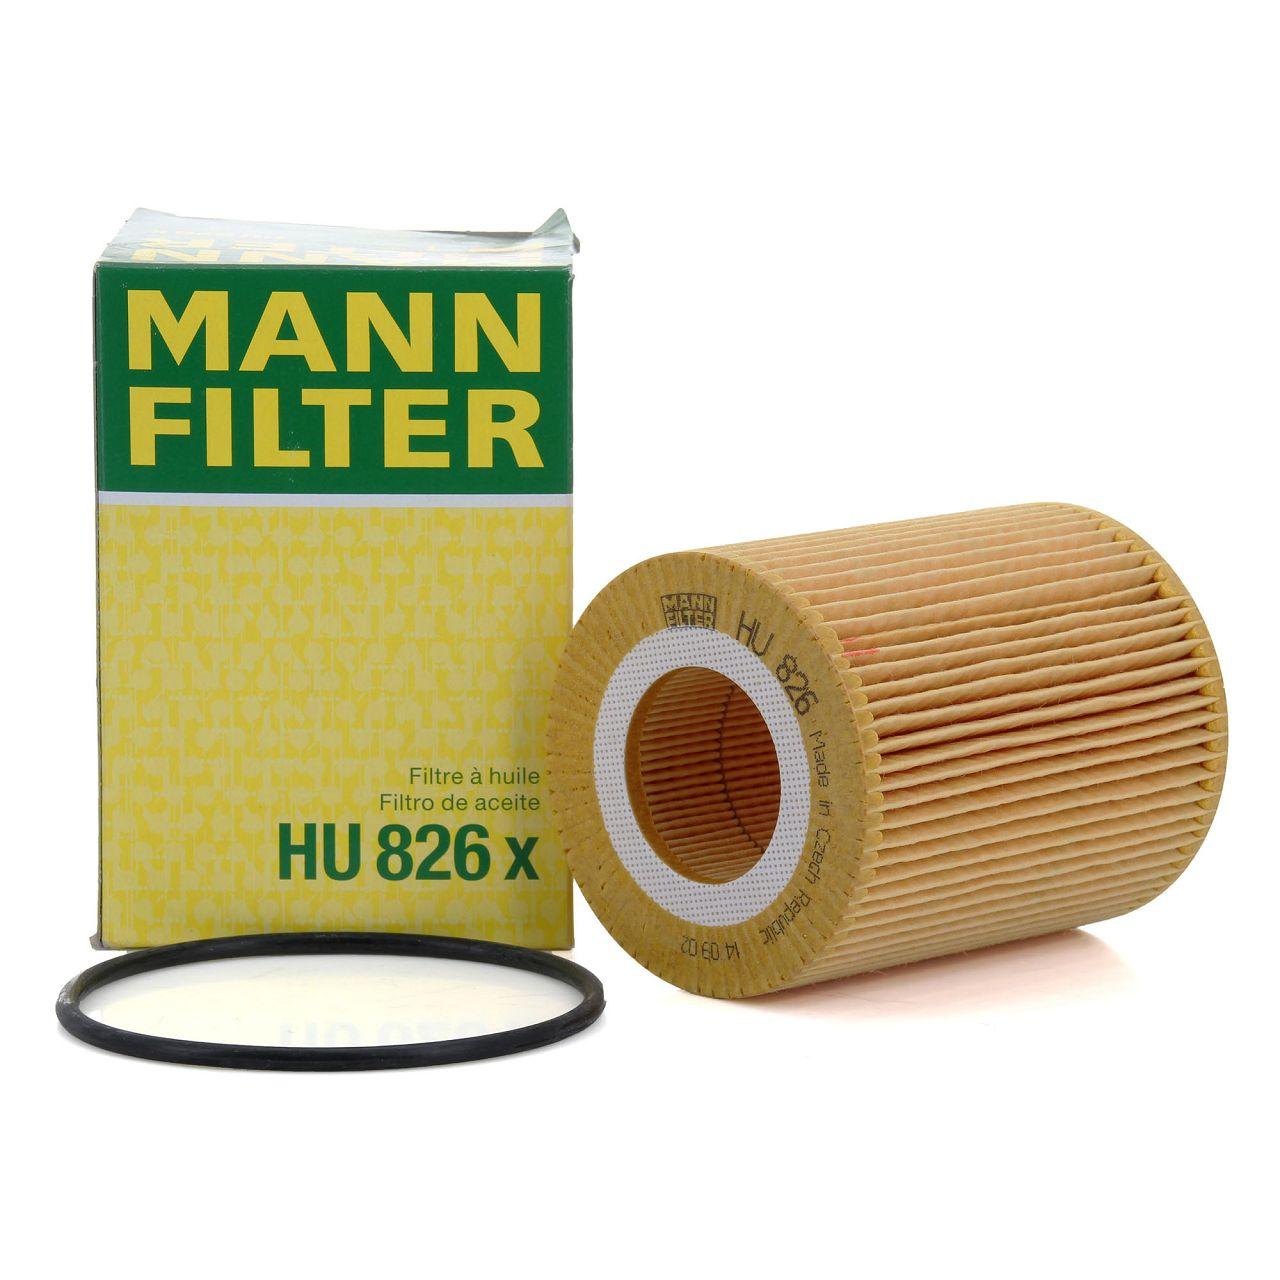 MANN Ölfilter HU826x für CITROEN C5 C6 / PEUGEOT 407 COUPE 3.0HDi 241 PS 1109.AV